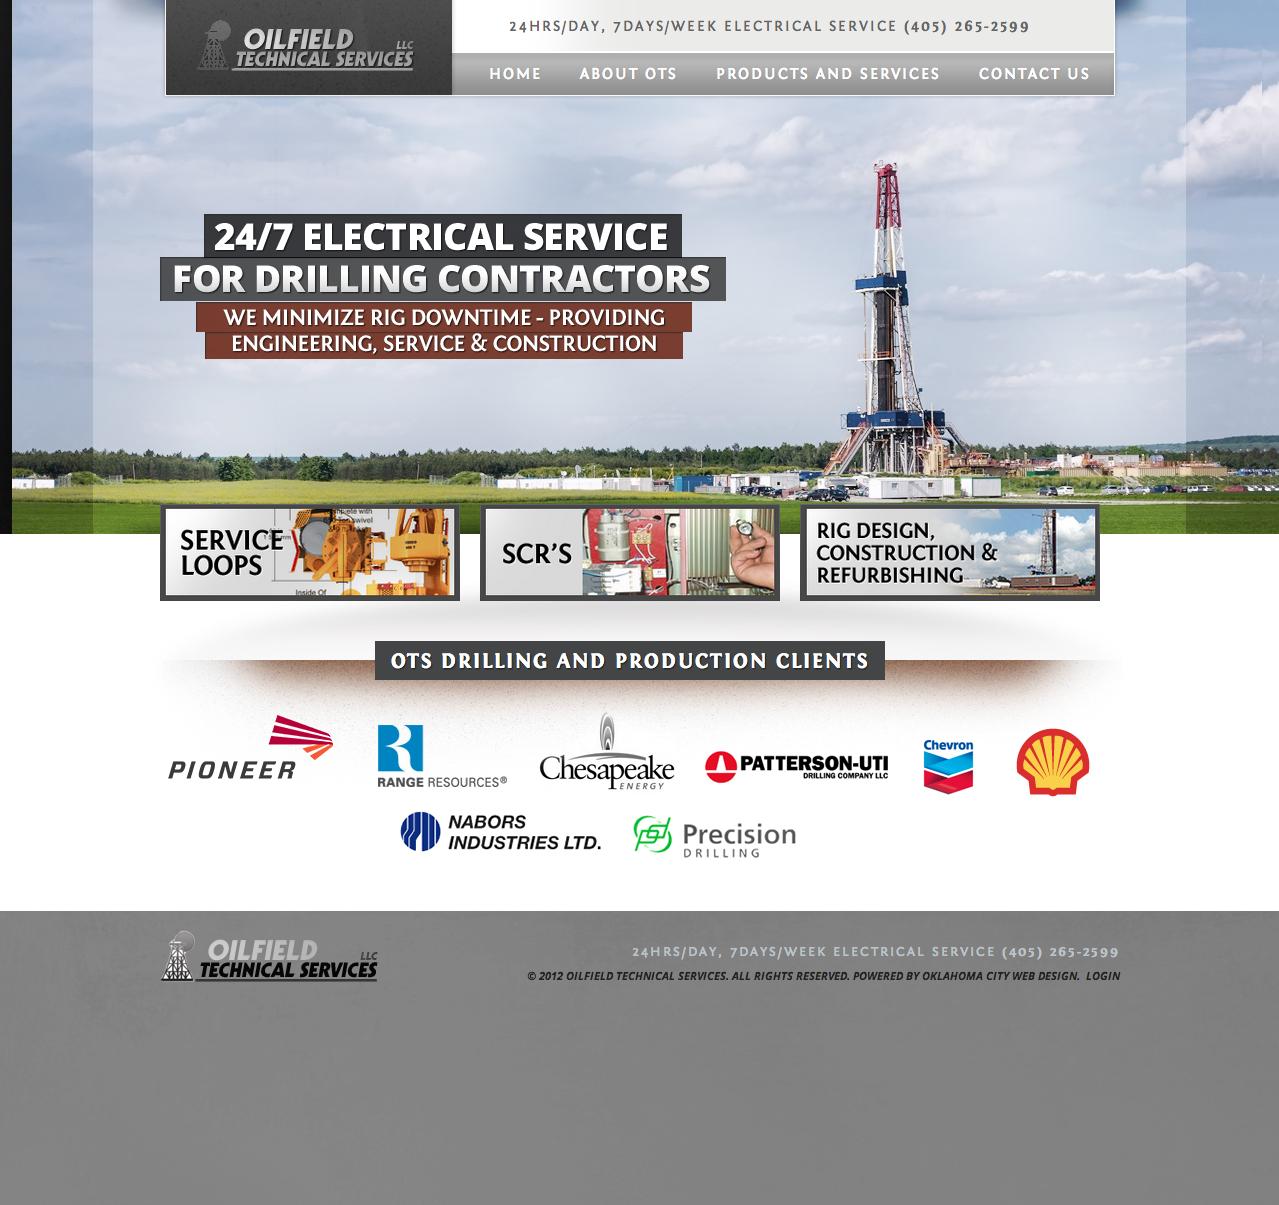 Oilfield Technical Services Web Design Oklahoma City